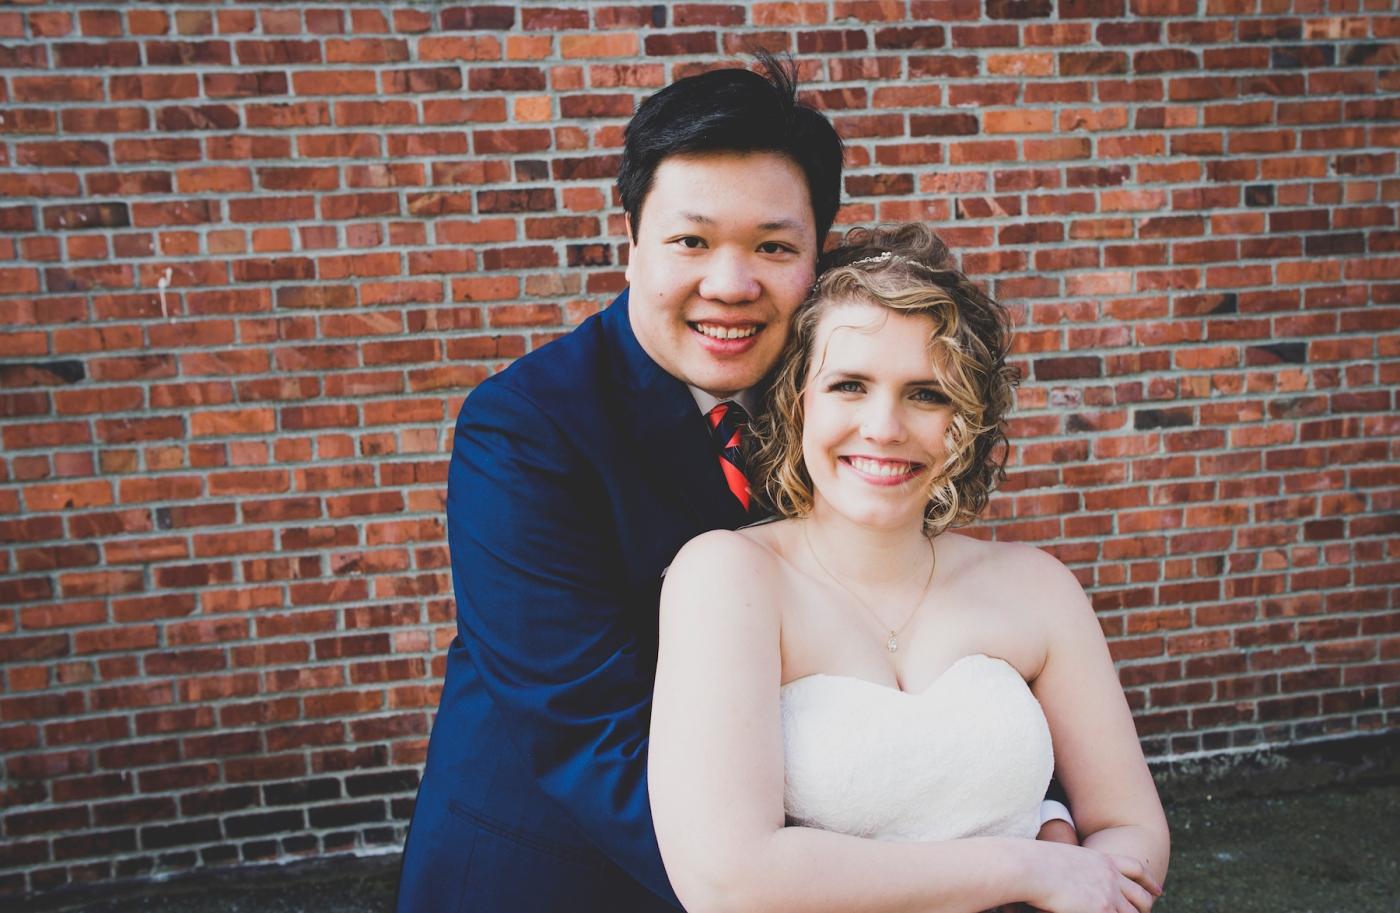 DSC_2136Everett_Wedding_Ballroom_Jane_Speleers_photography_Rachel_and_Edmund_Bridesmaids_peach_dresses_groomsmen_2017